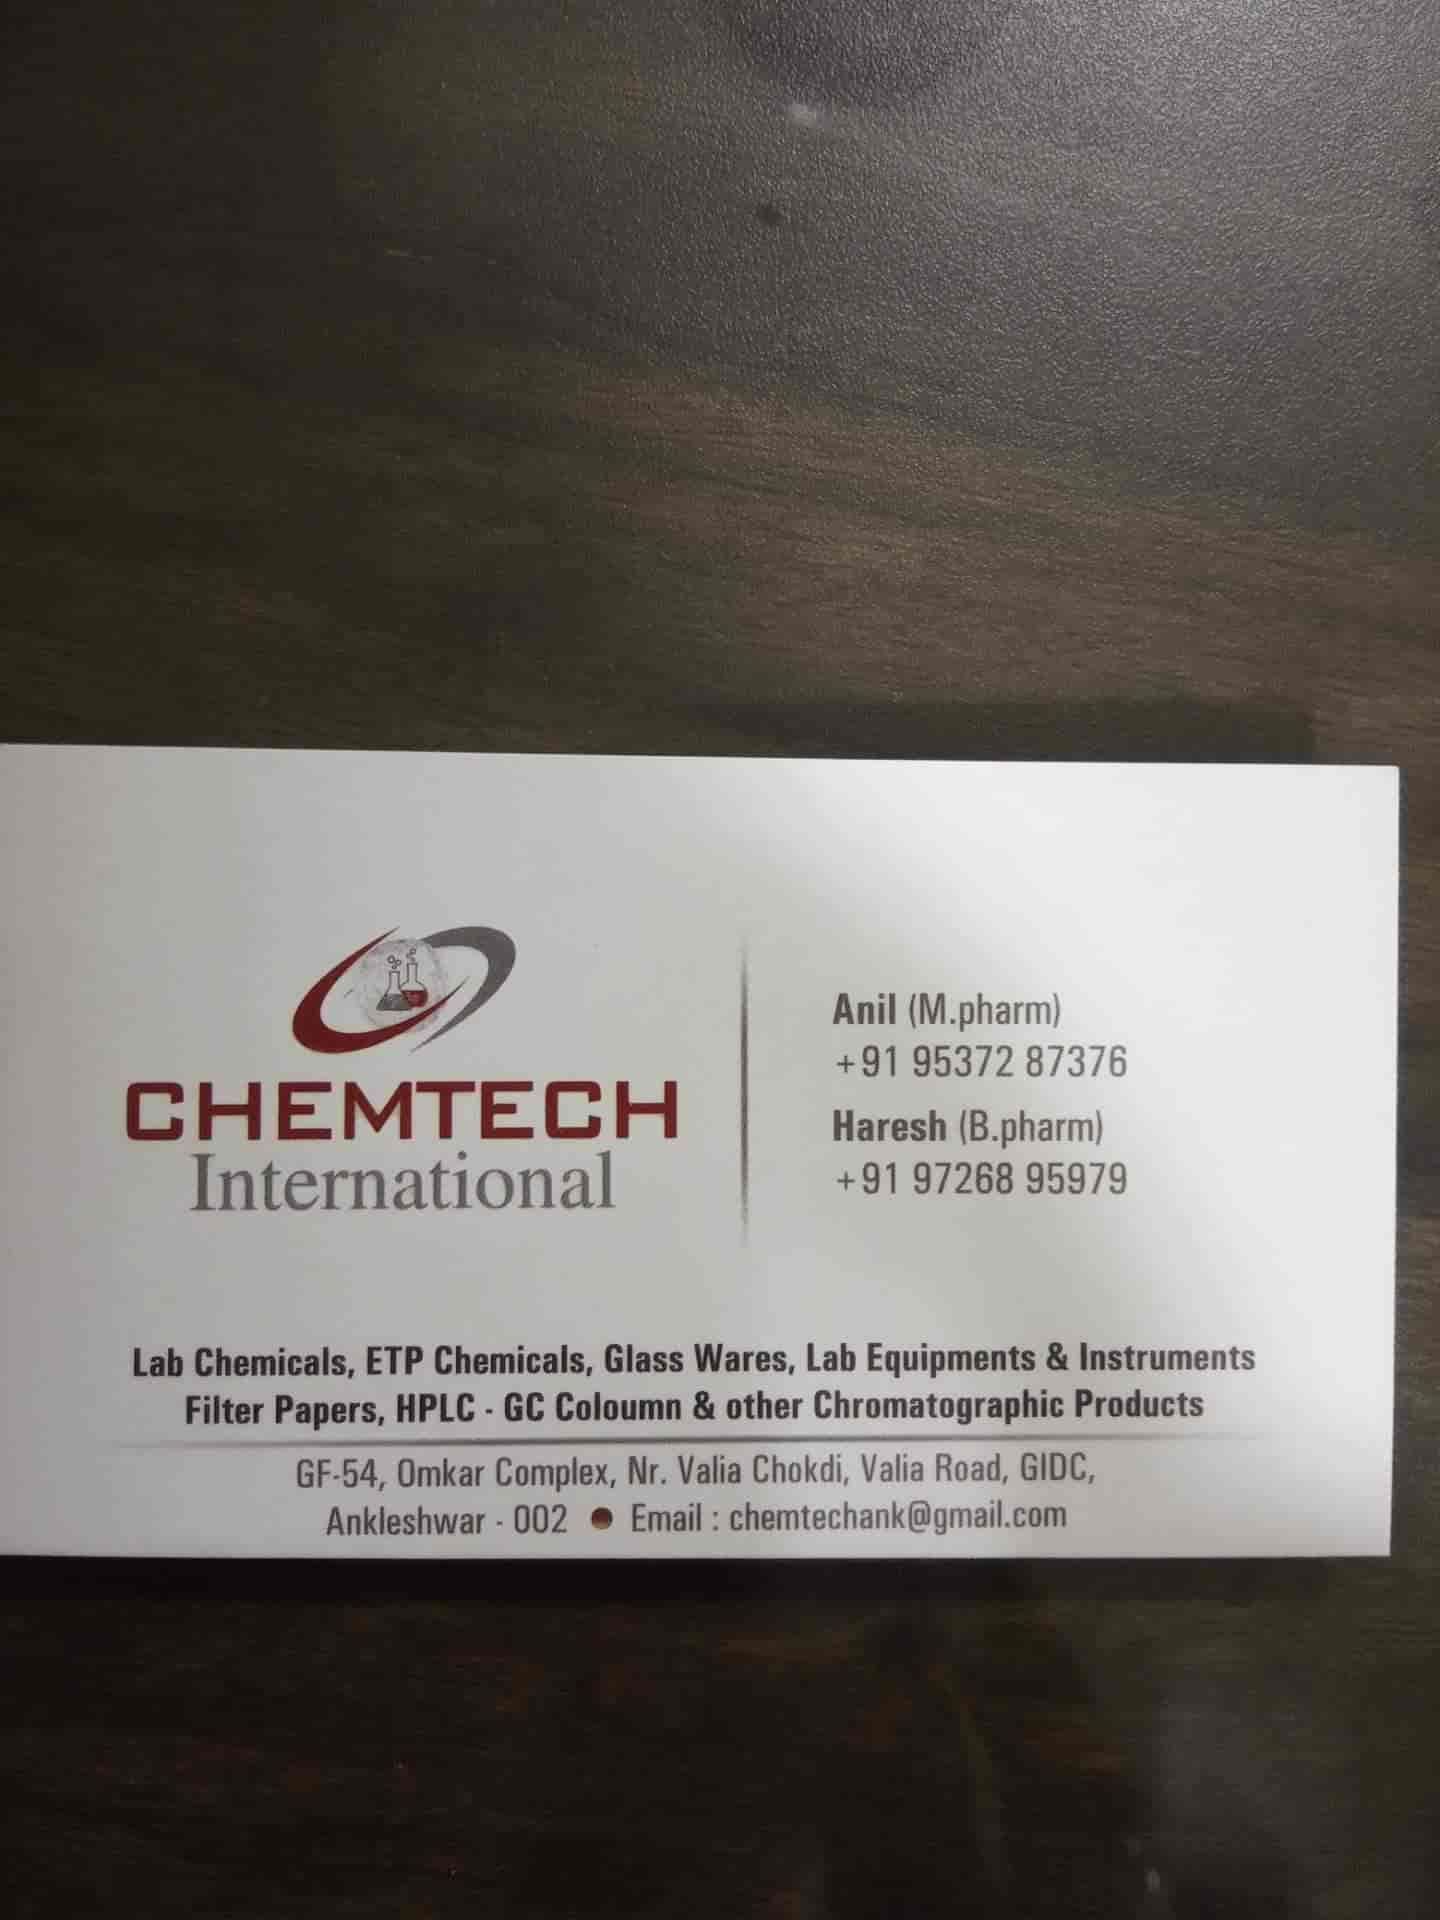 Chemtech International, GIDC - Lab Chemical Dealers in Ankleshwar